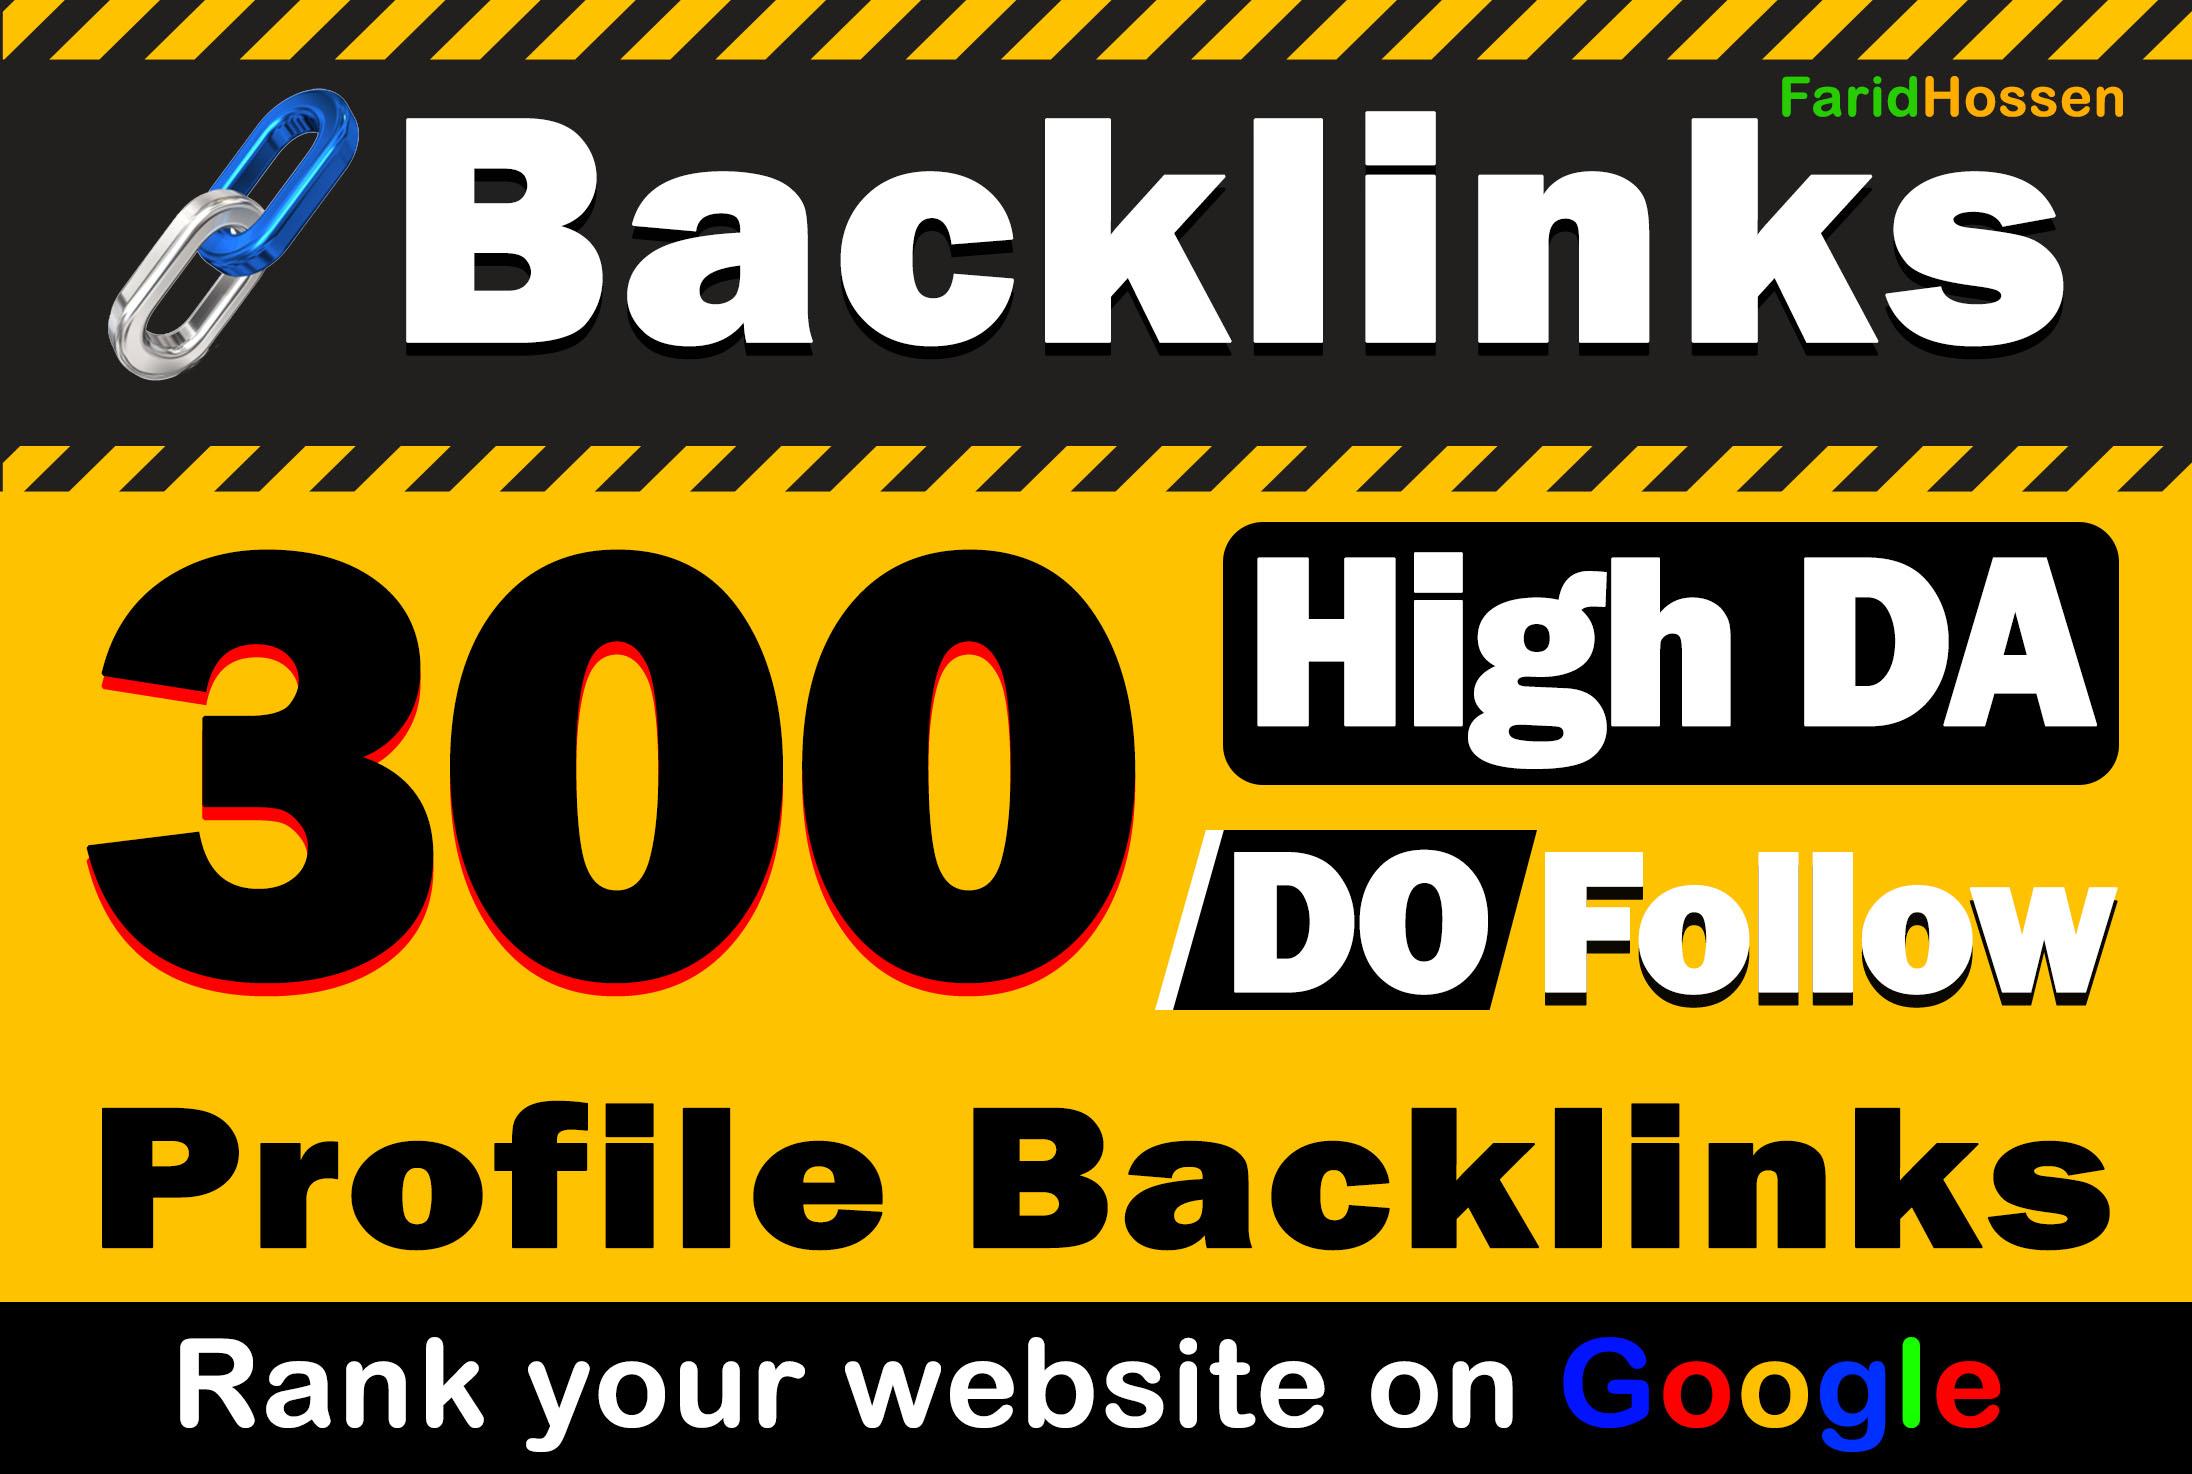 Manually 300 Profile Backlinks High DA, PA, PR Permanent White Hat Method